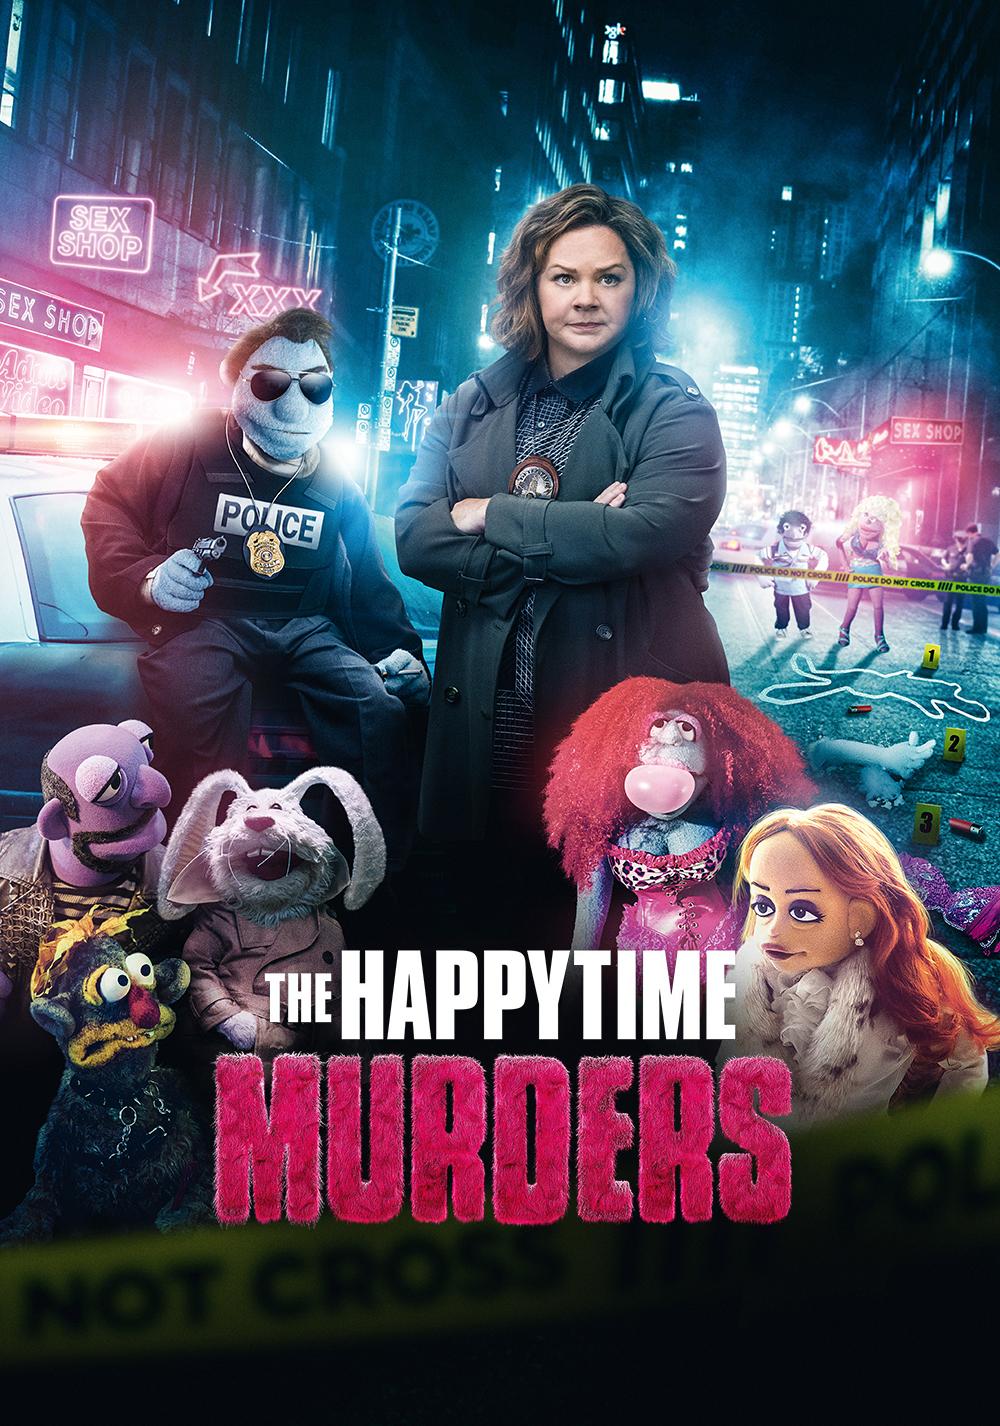 The Happytime Murders